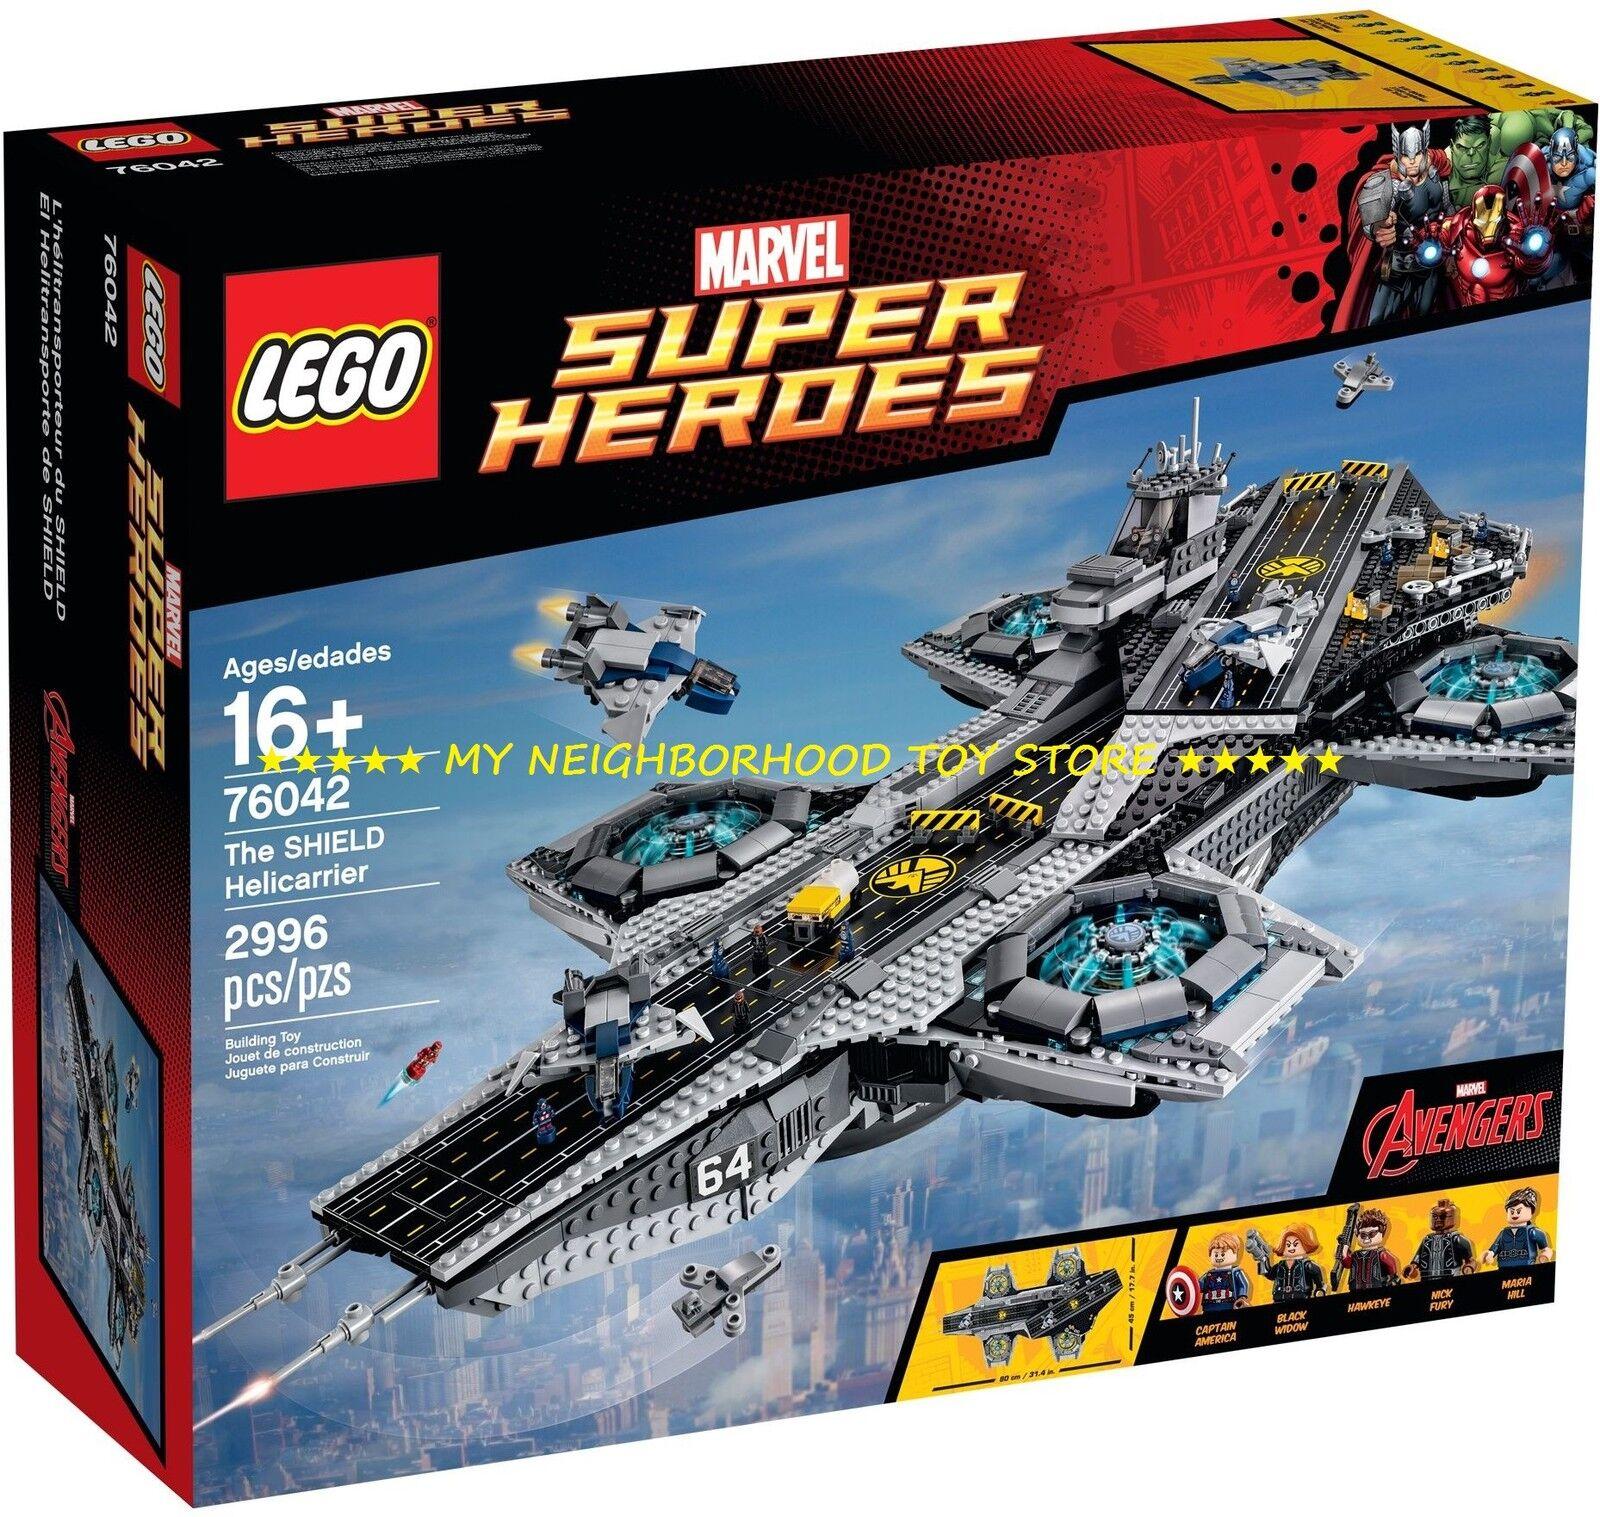 RETIrojo - LEGO 76042 UCS MARVEL súper HEROES™ HELICocheRIER SHIELD (motorizzabile)